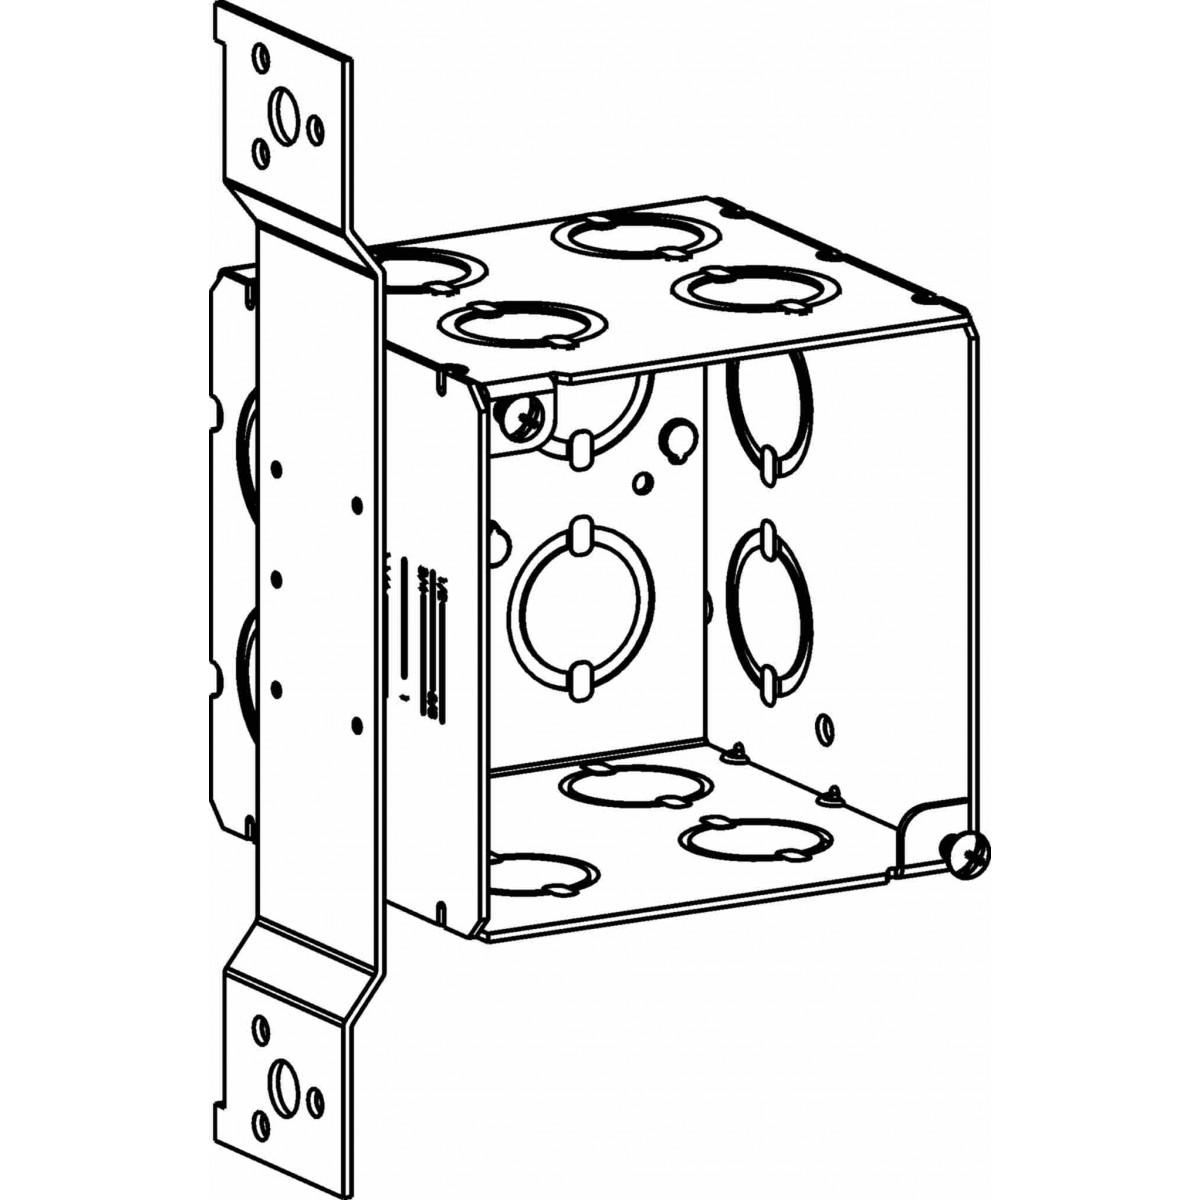 4sedb-cko-fb - 4 u201d  4s  boxes